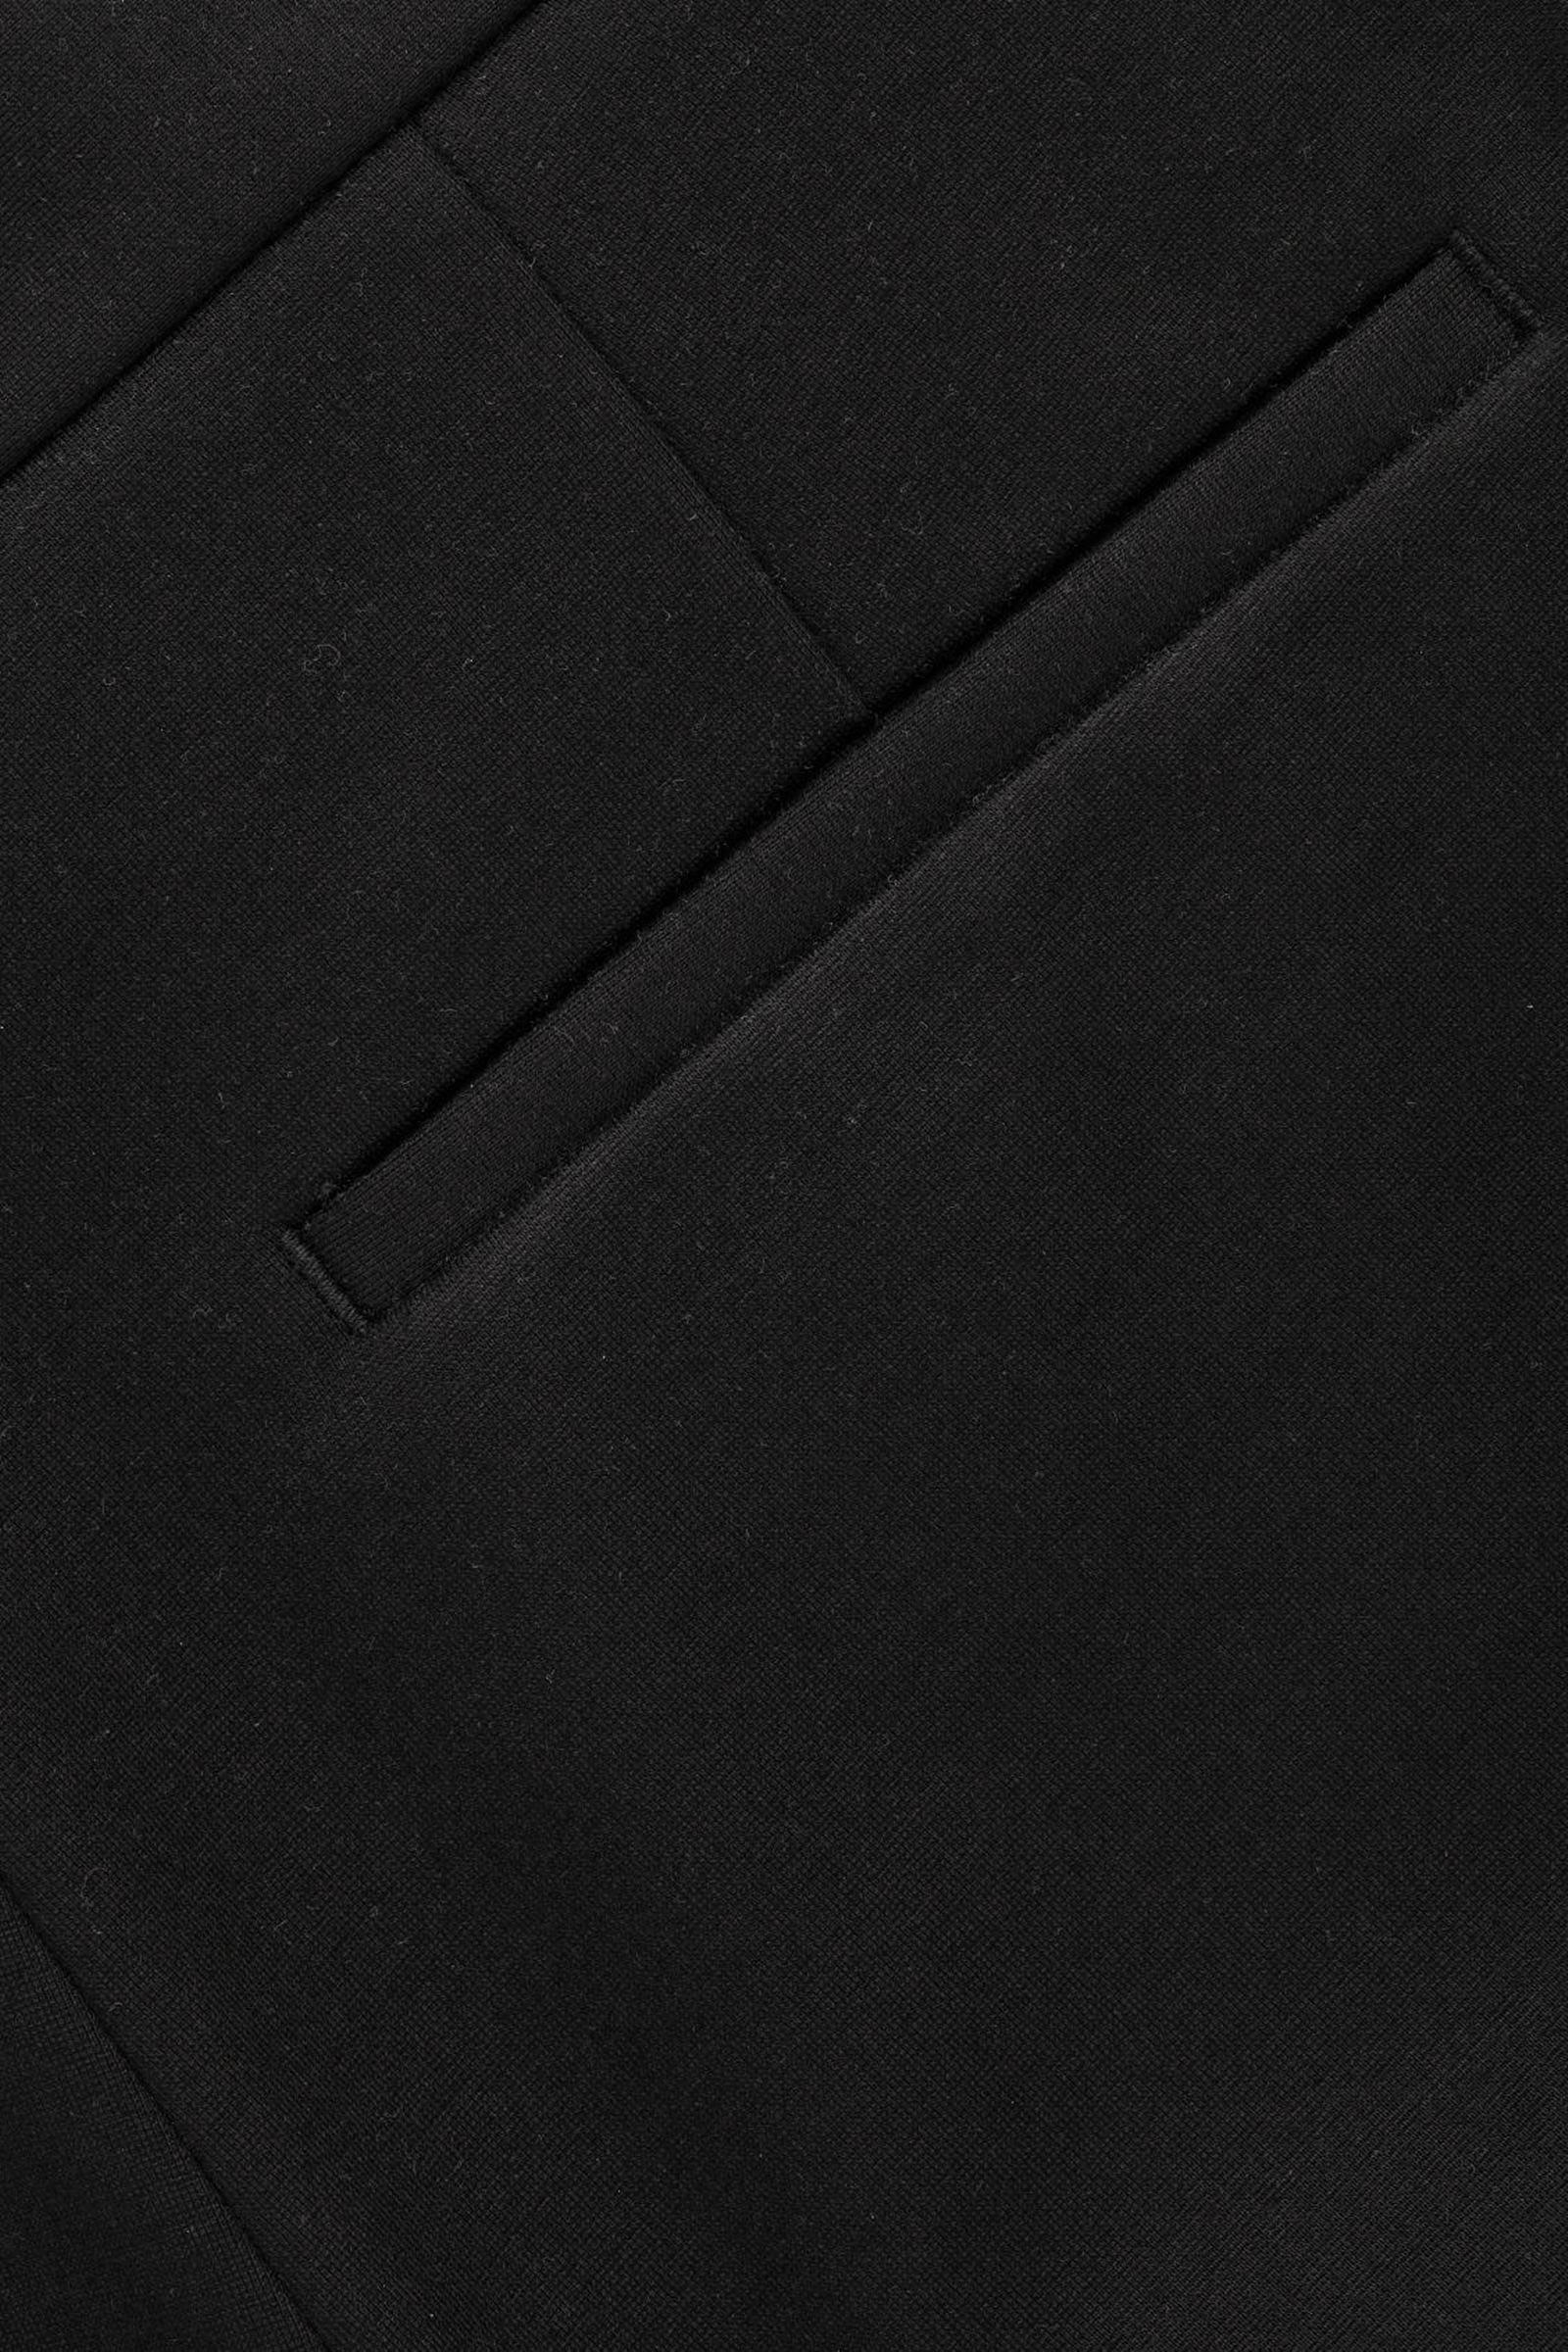 COS 크롭트 집 커프 트라우저의 블랙컬러 Product입니다.